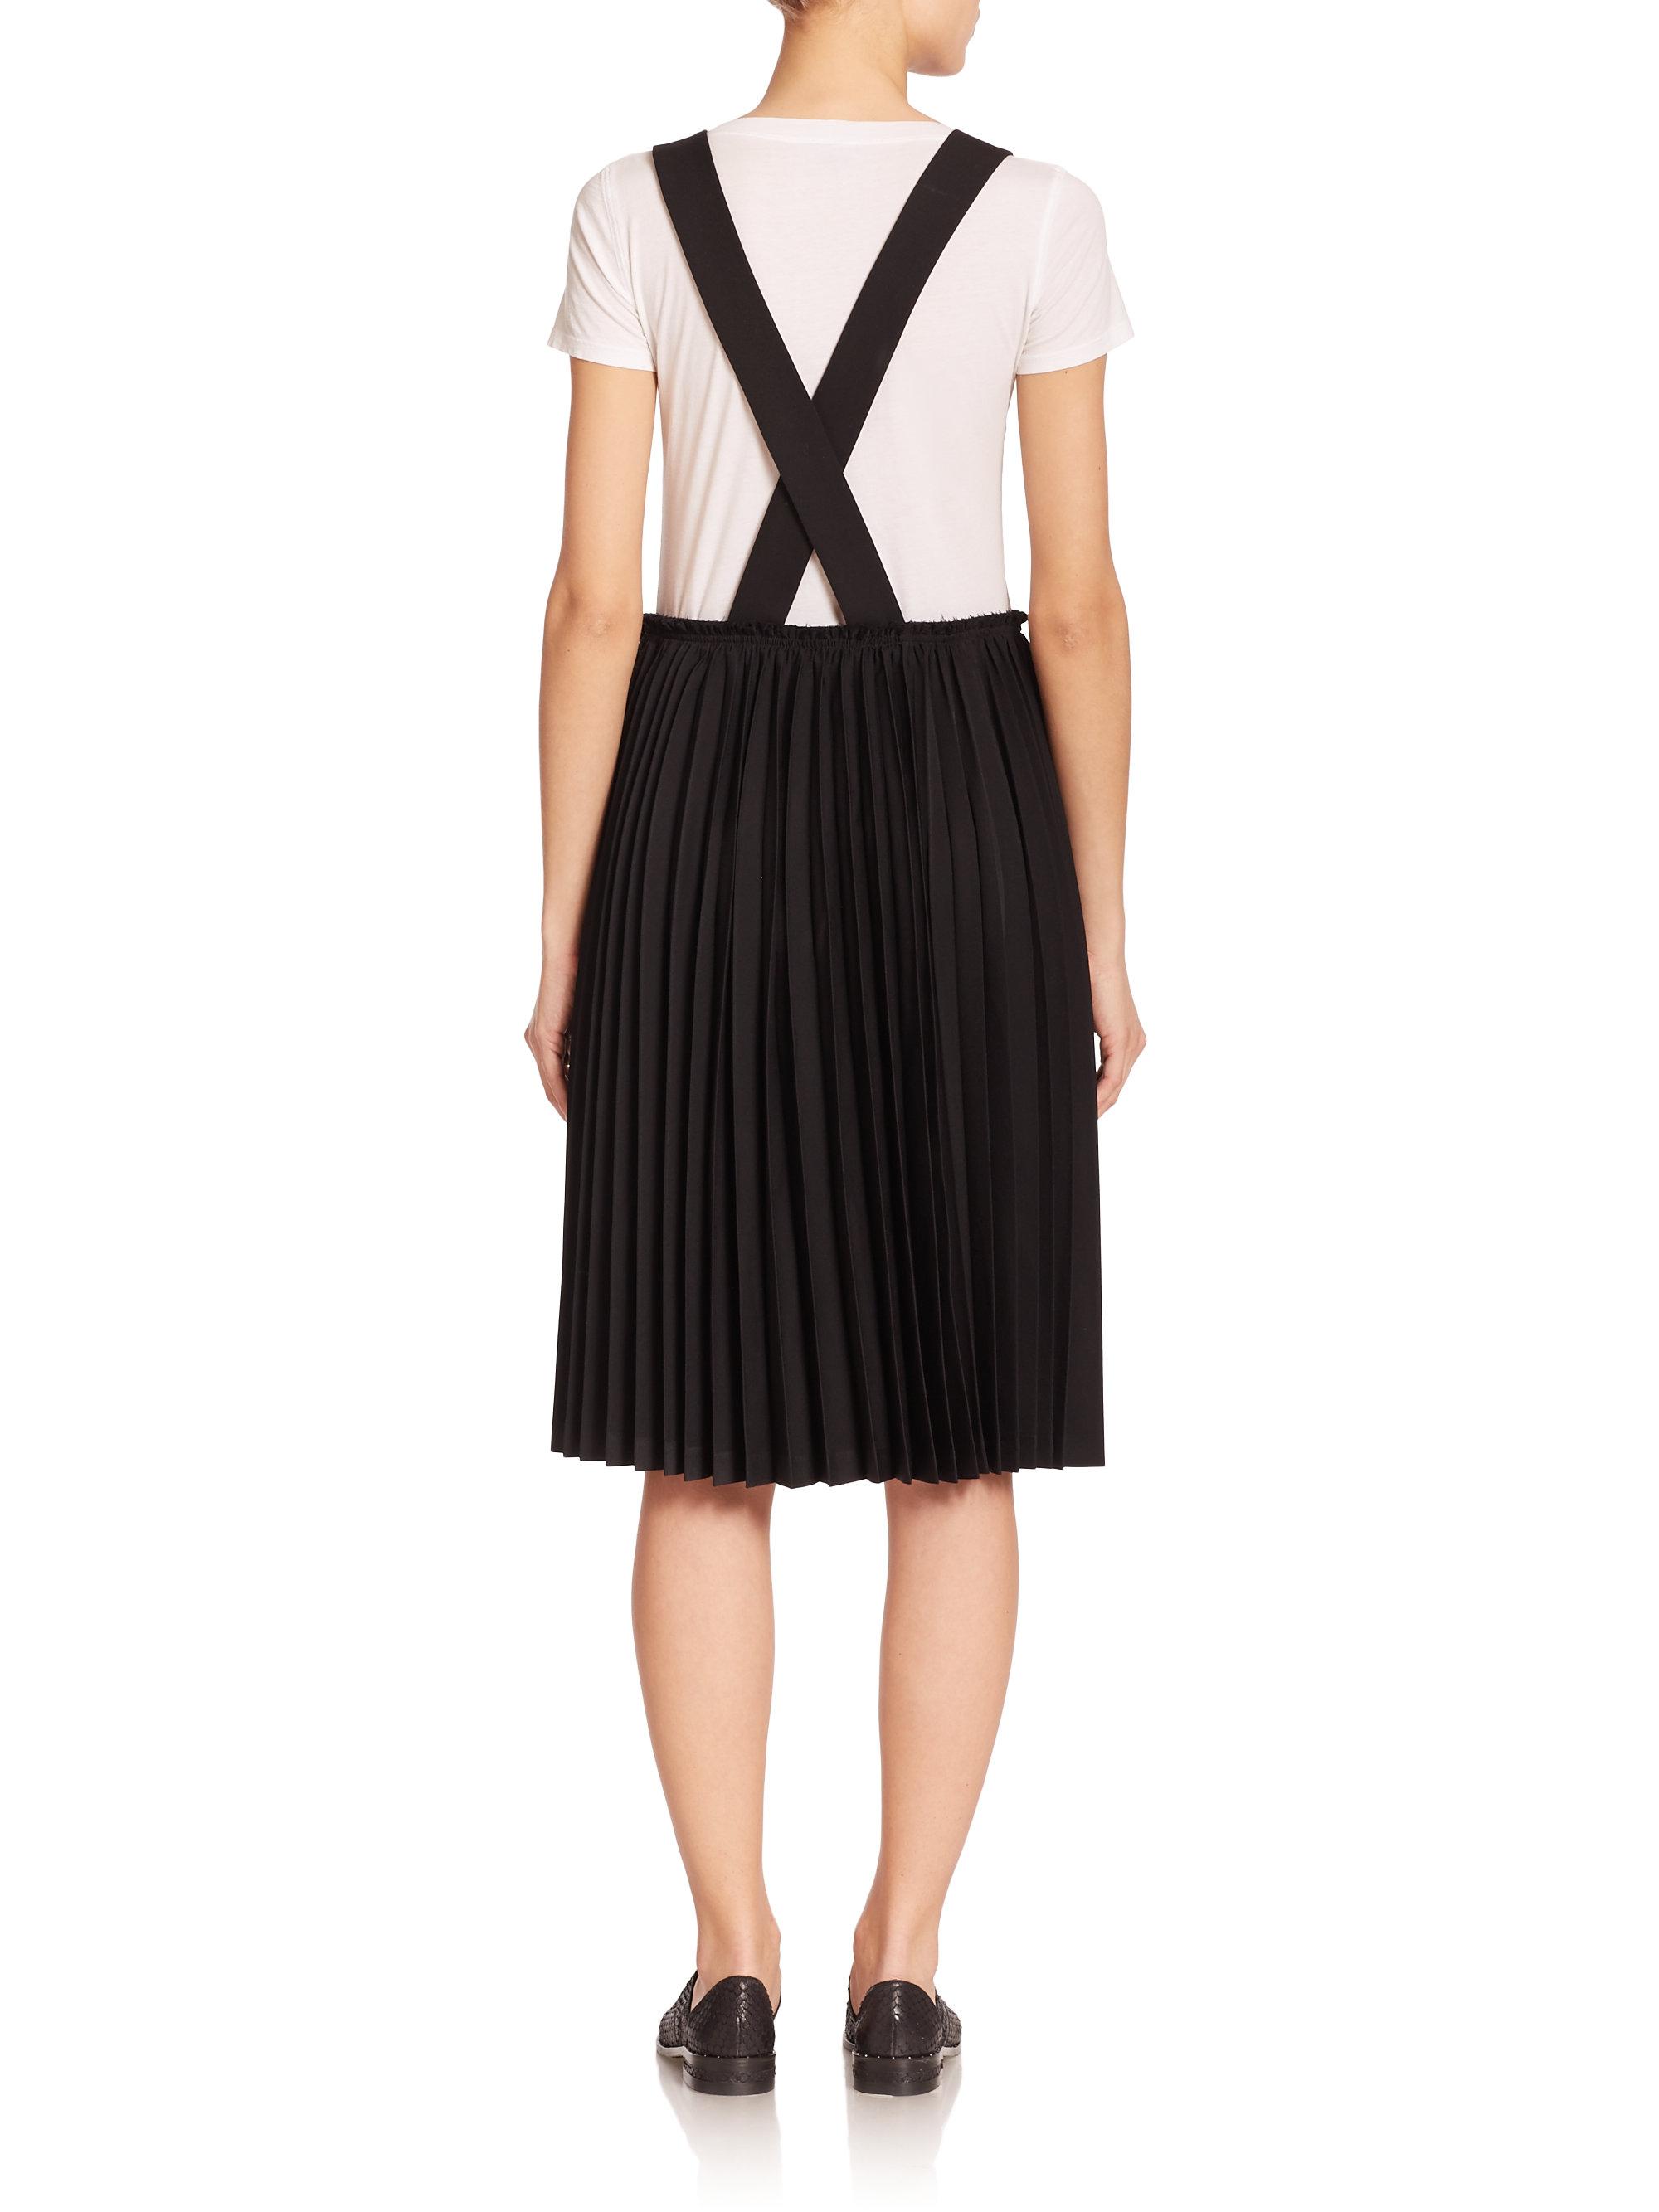 Skirt Overall 28